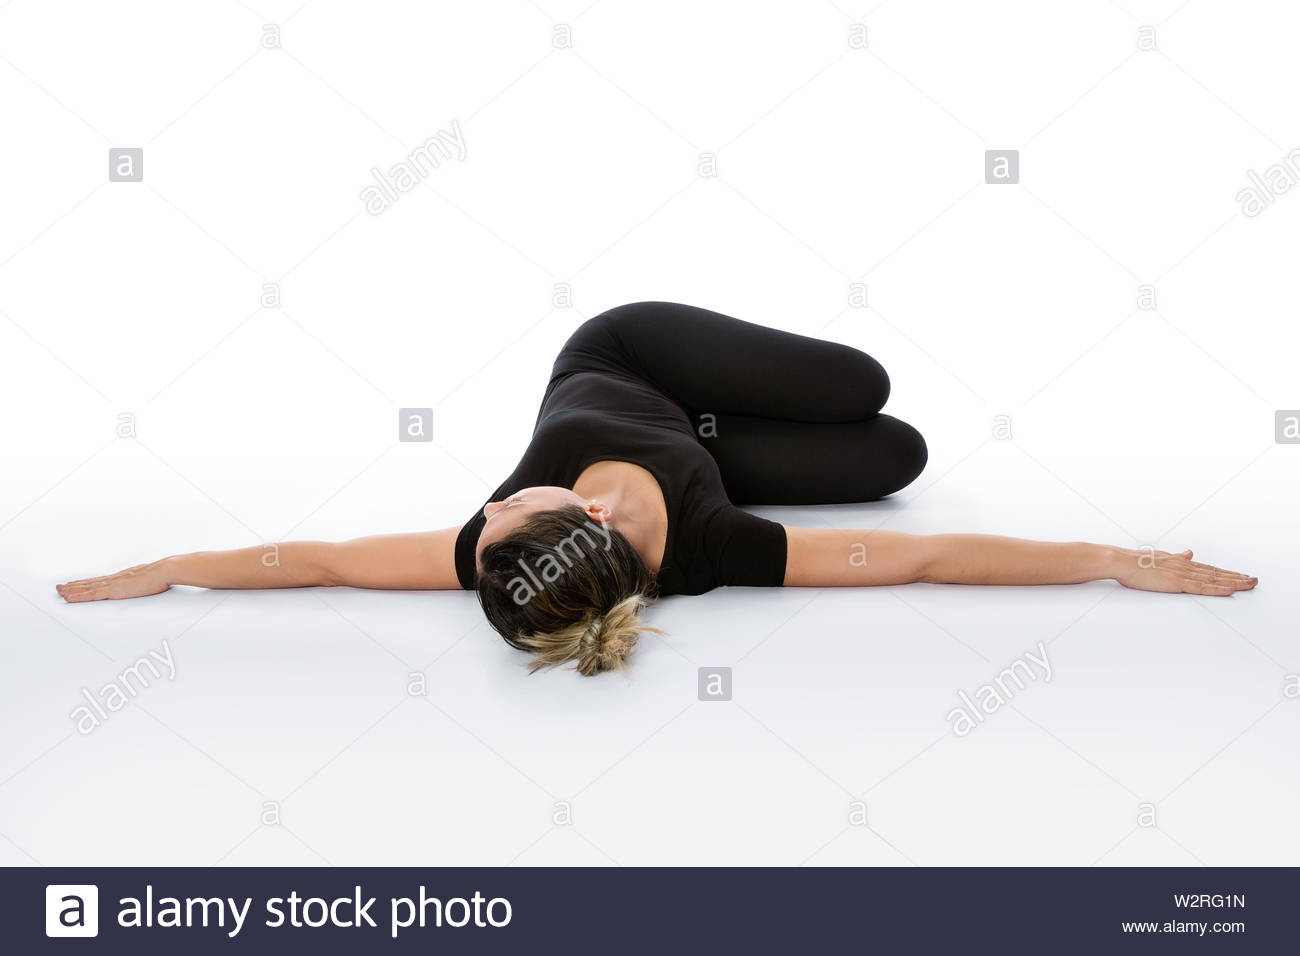 Supta Matsyendrasana yoga pose (Reclined Spinal Twist pose). Yoga poses woman isolated with white background. Yoga pose set. Mindfulness and Spiritual - Stock Image